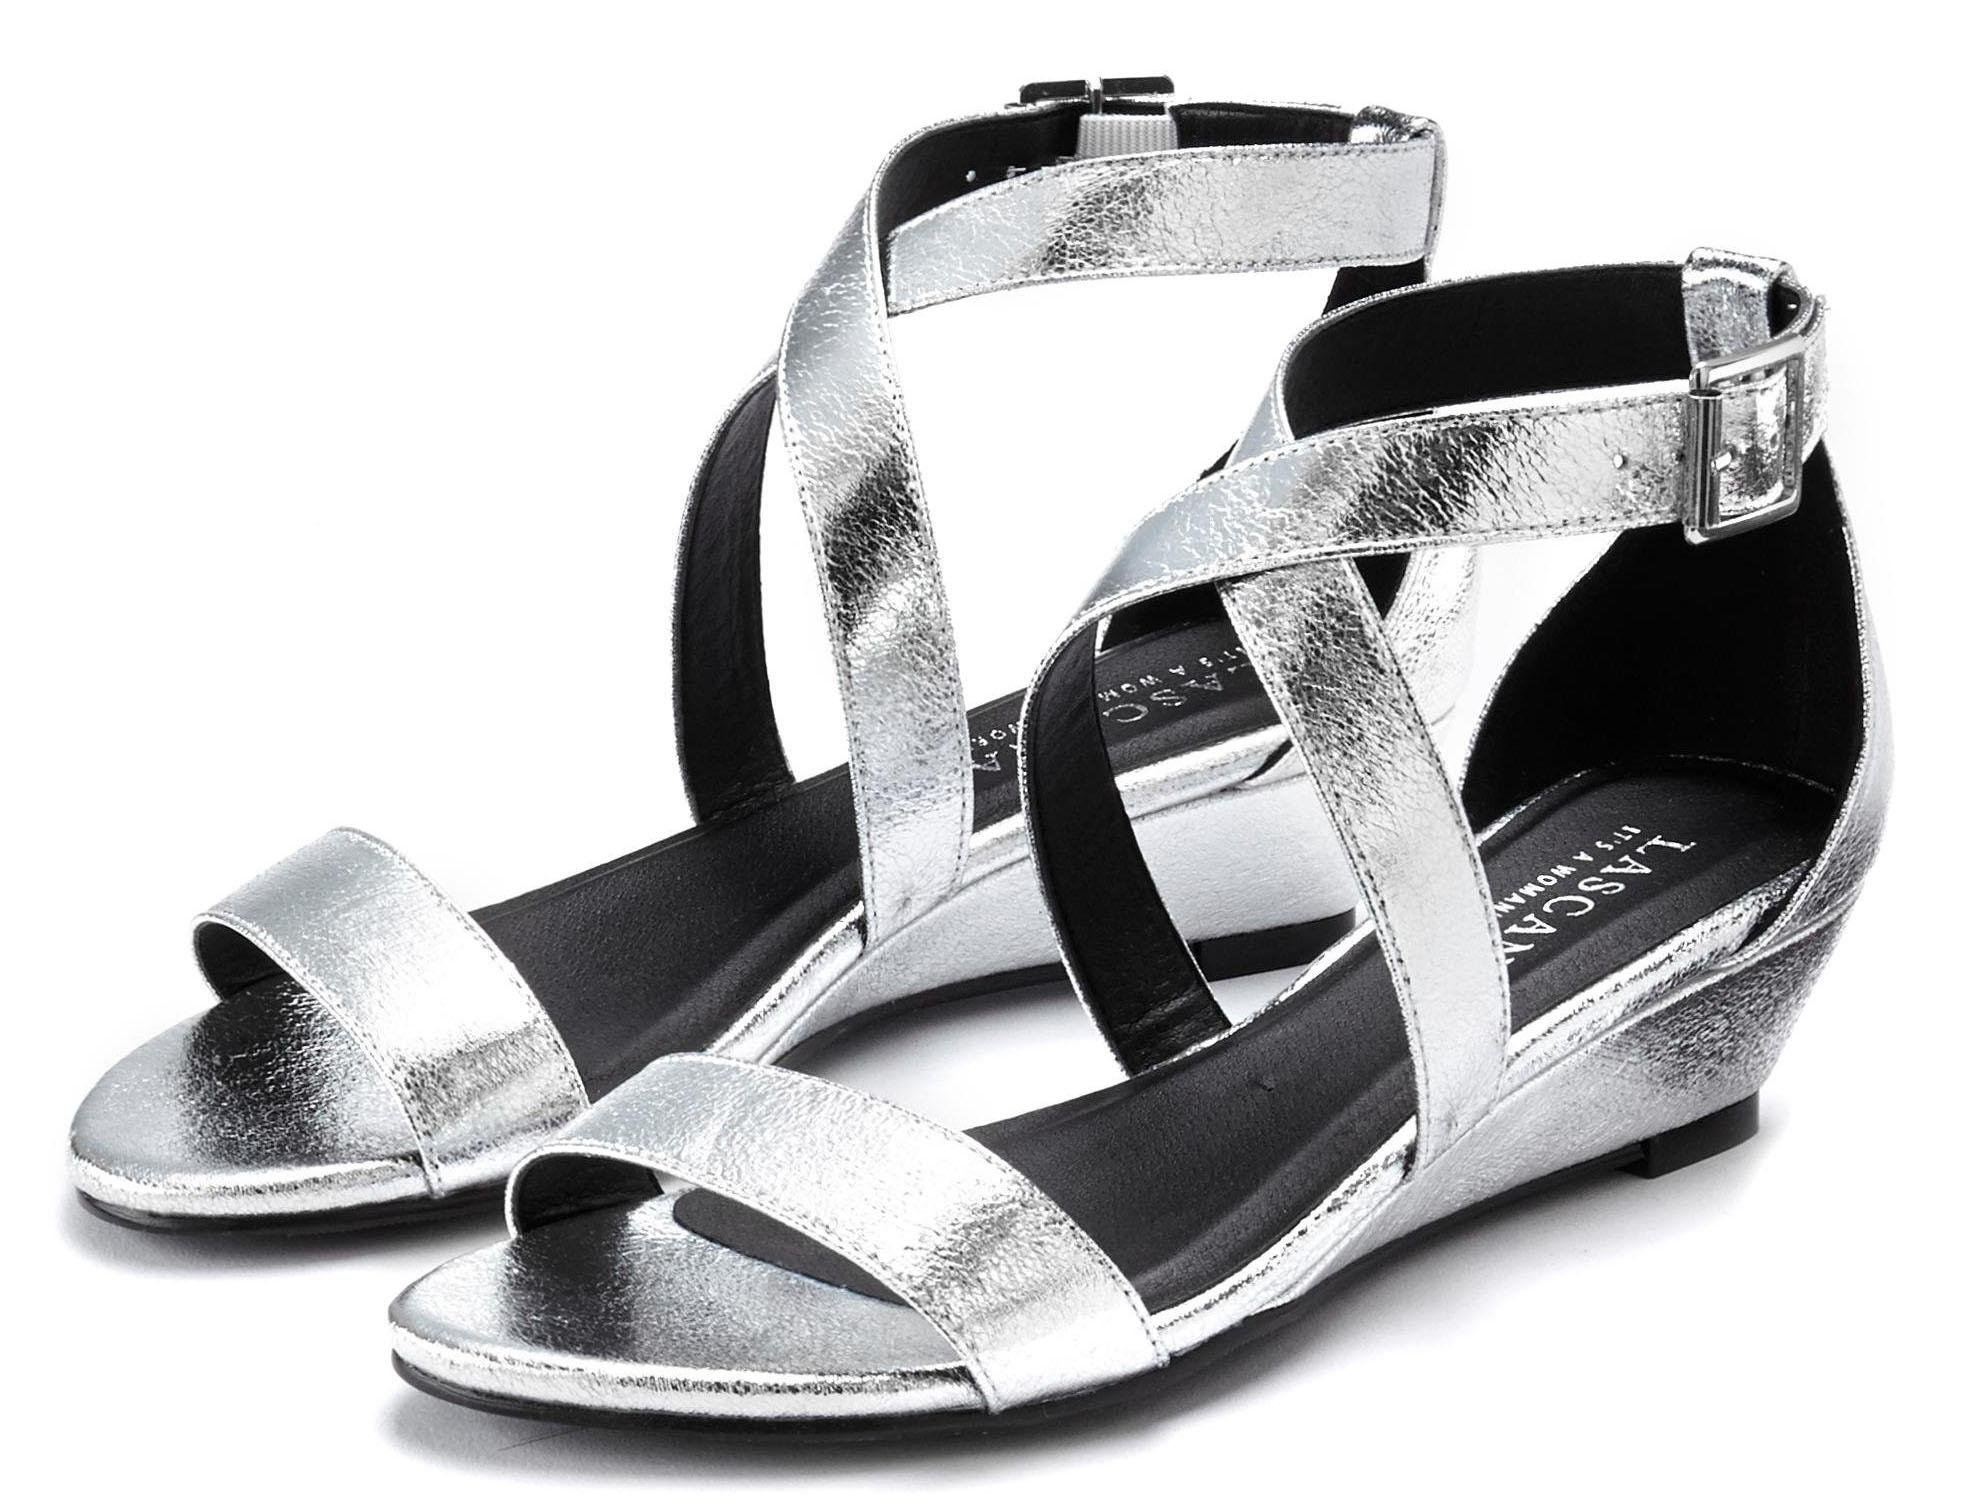 LASCANA sandaaltjes nu online kopen bij Lascana